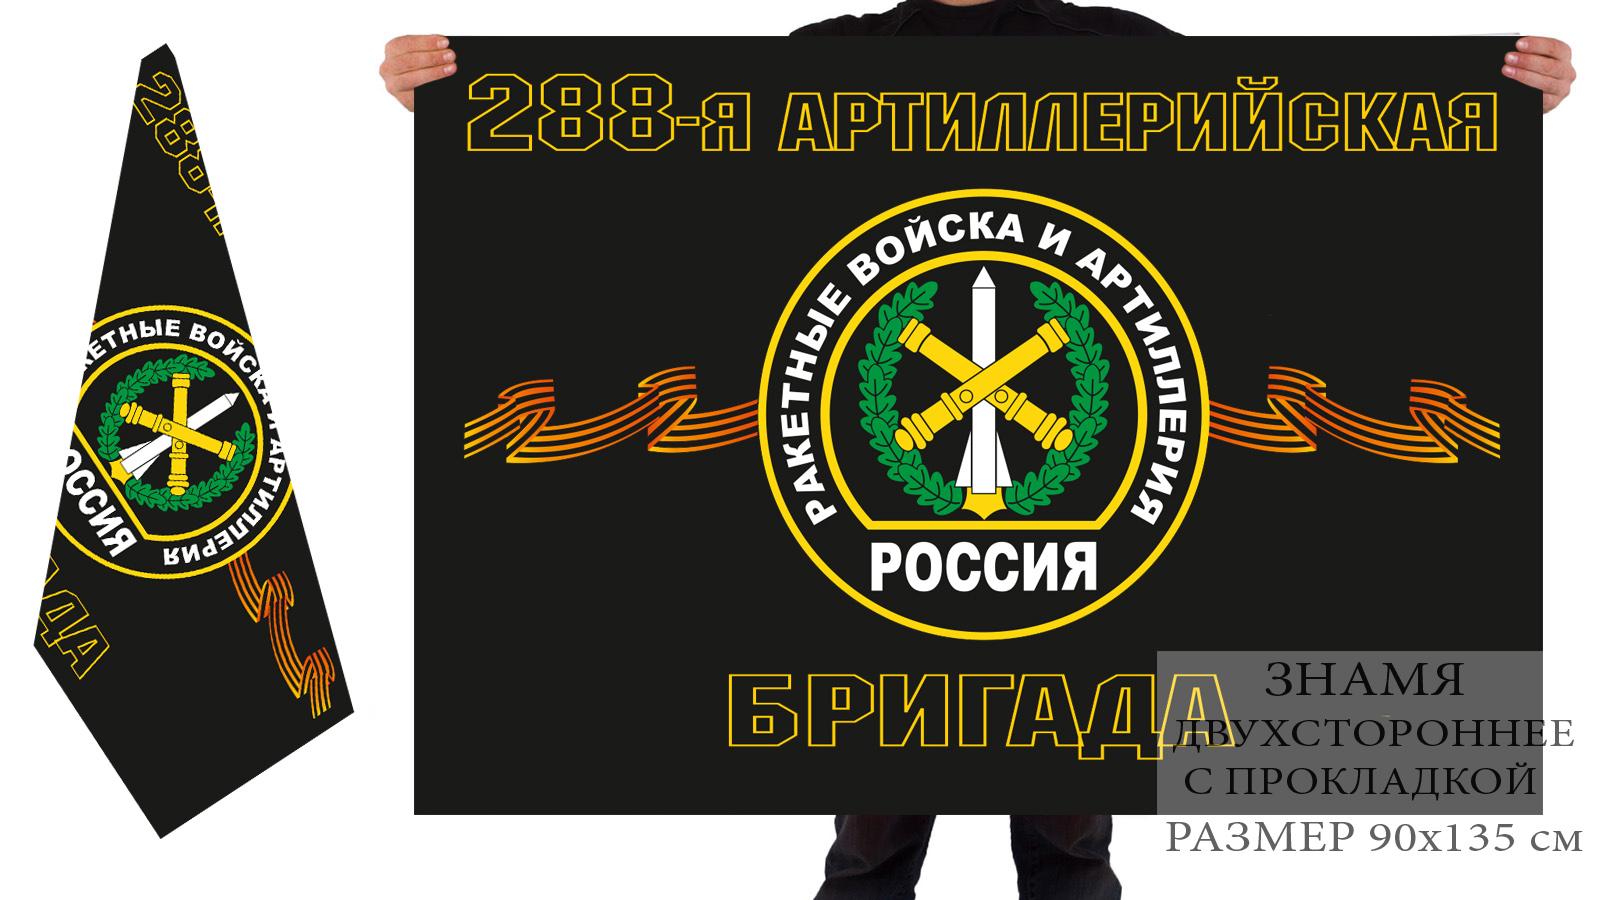 Двусторонний флаг 288-ой артиллерийской бригады РВиА